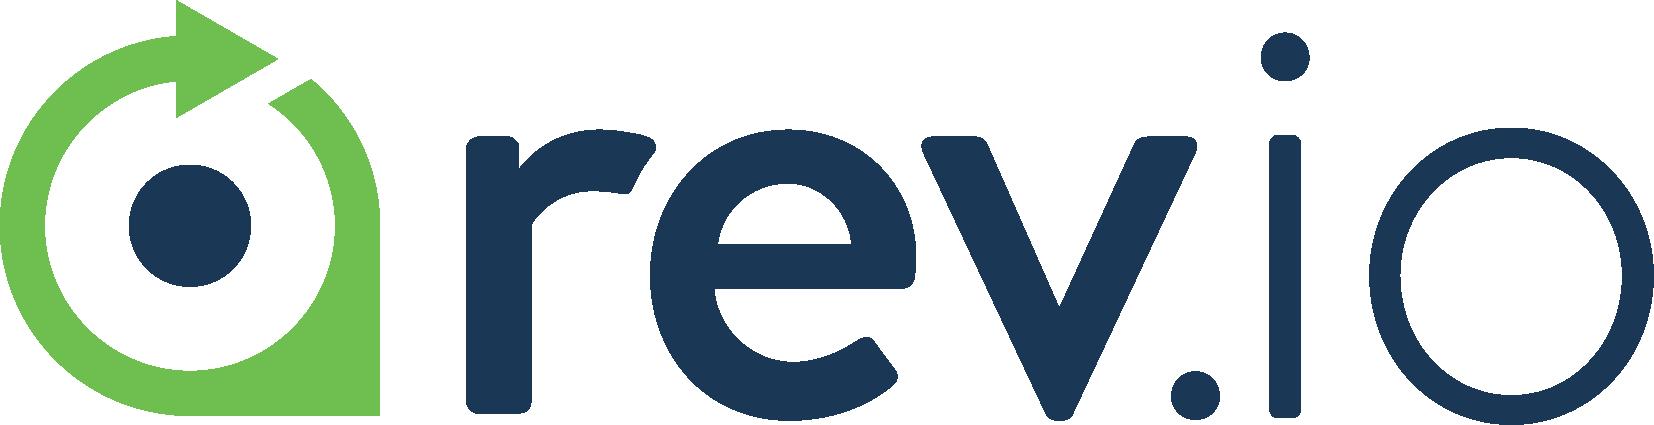 Rev.io Company Logo